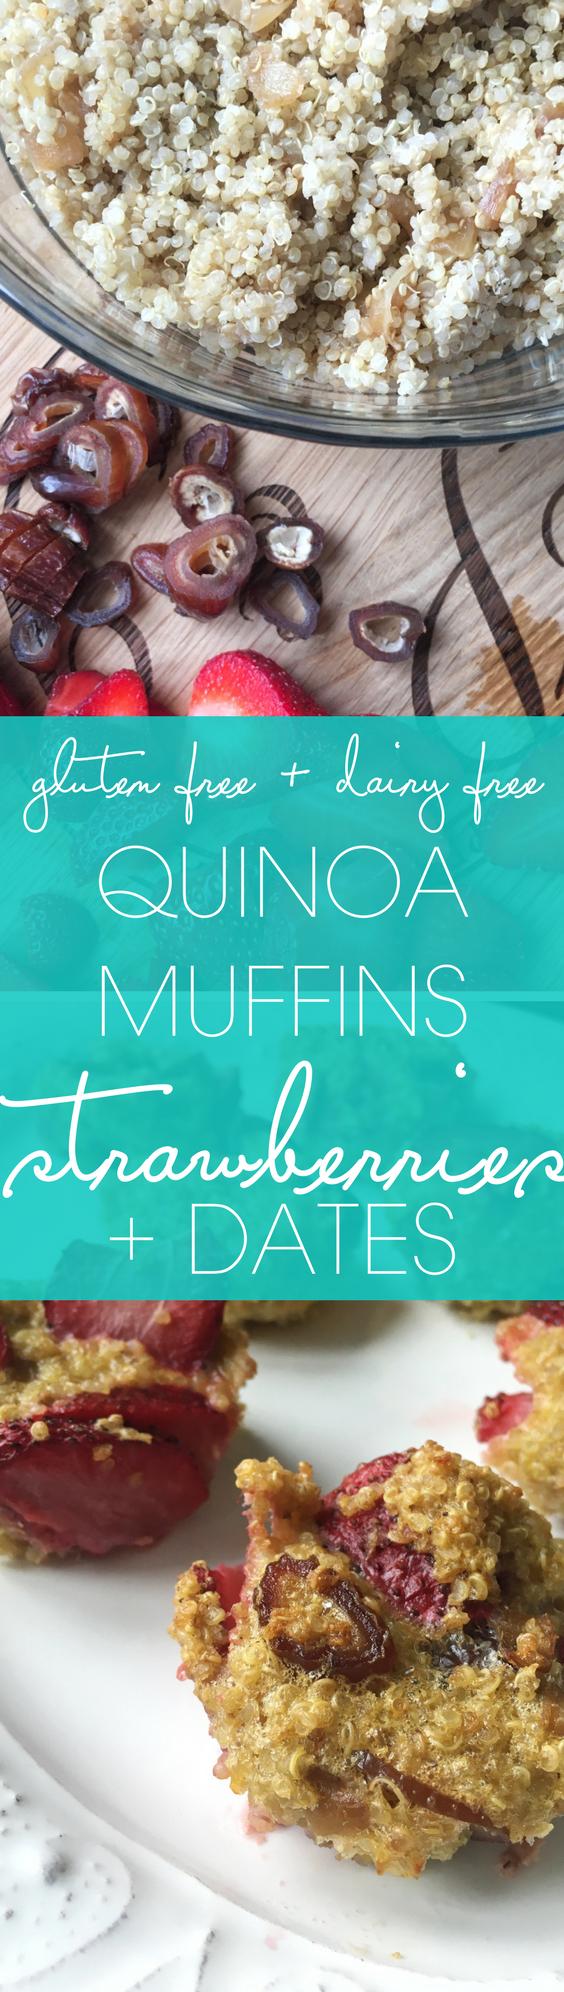 quinoa muffins with strawberries